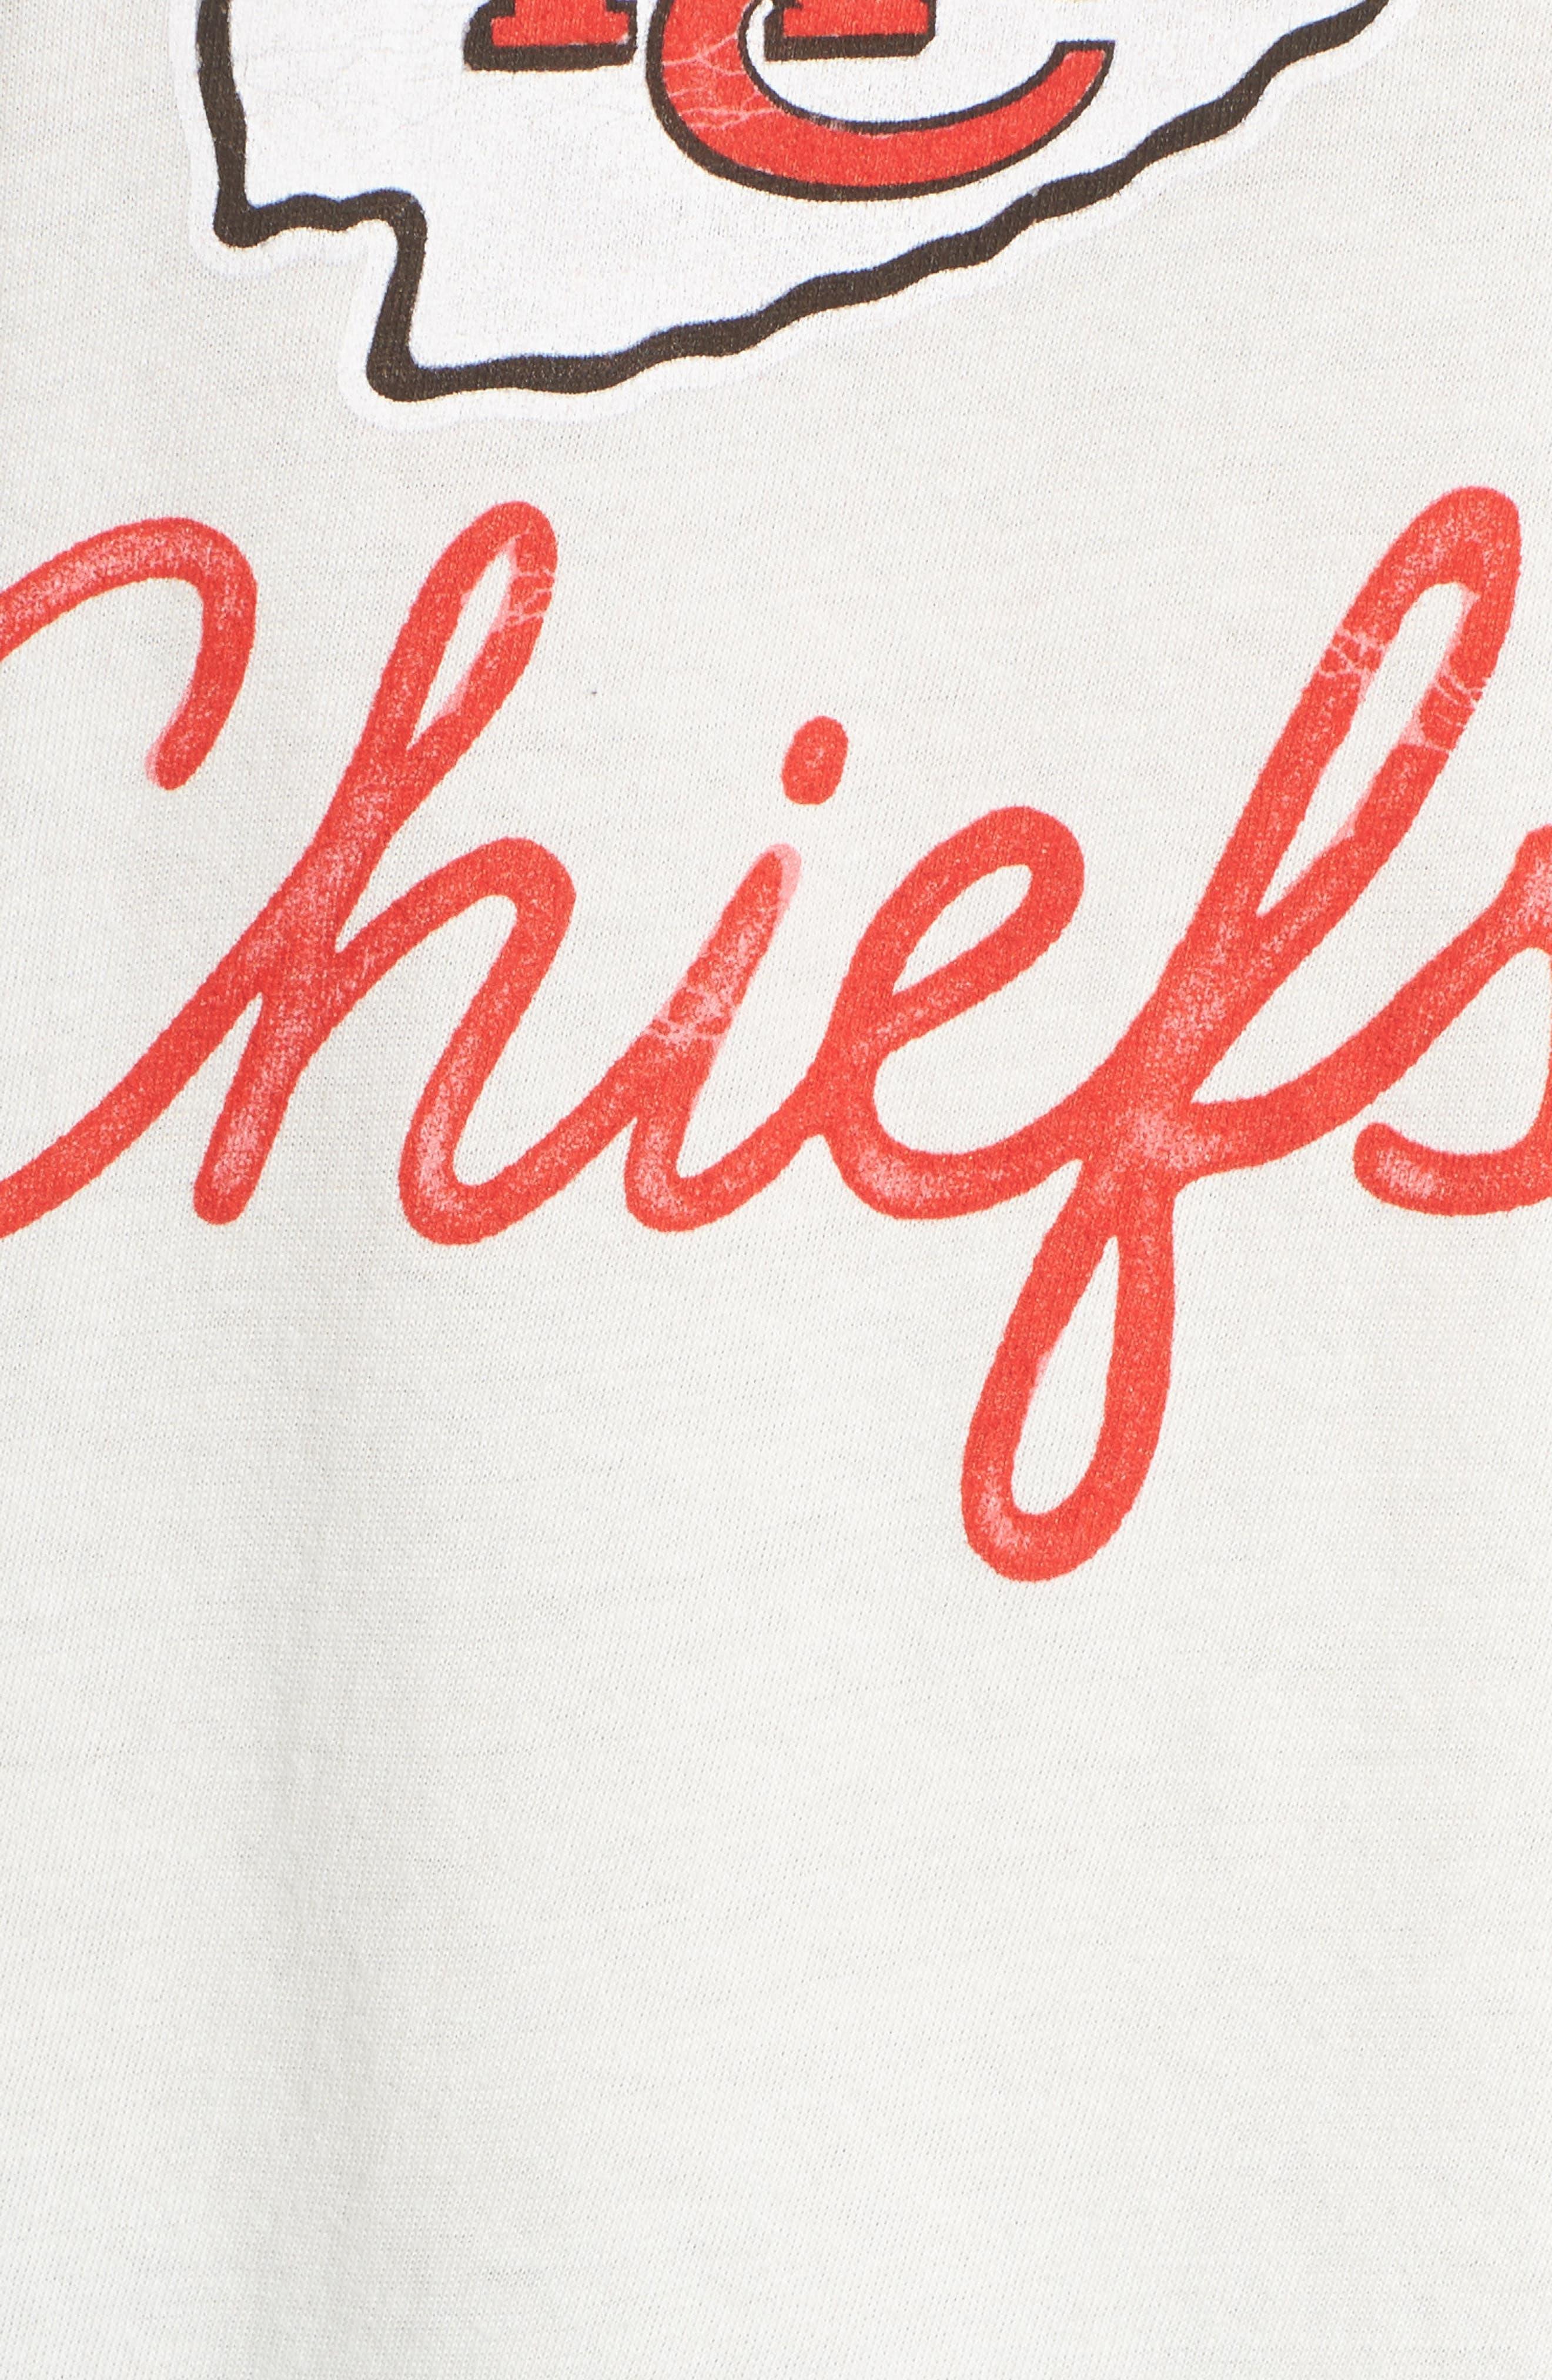 NFL Kansas City Chiefs Raglan Tee,                             Alternate thumbnail 5, color,                             189